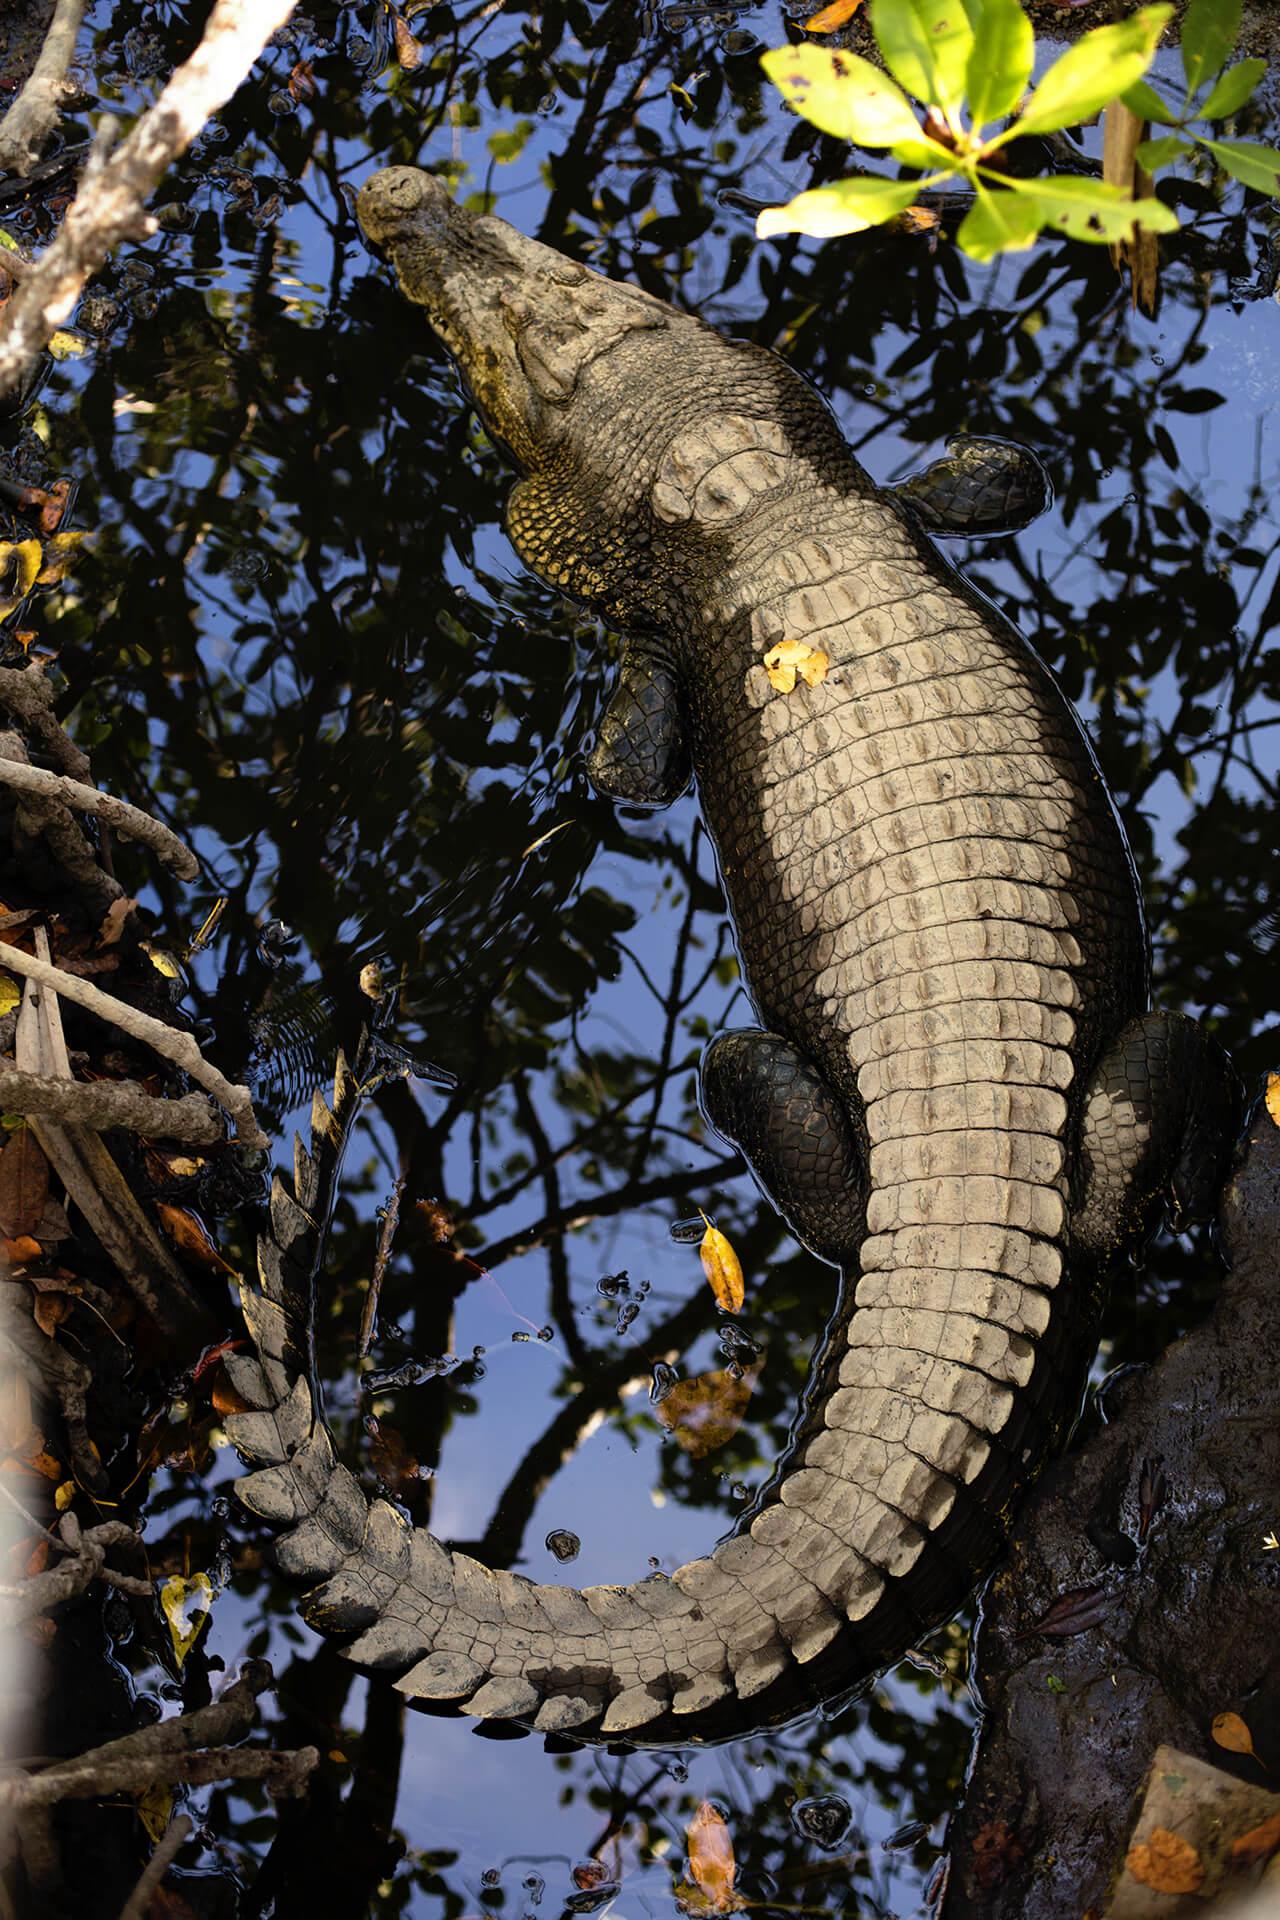 Treasure Island - Crocodiles haunt near the staff houses in the mangroves